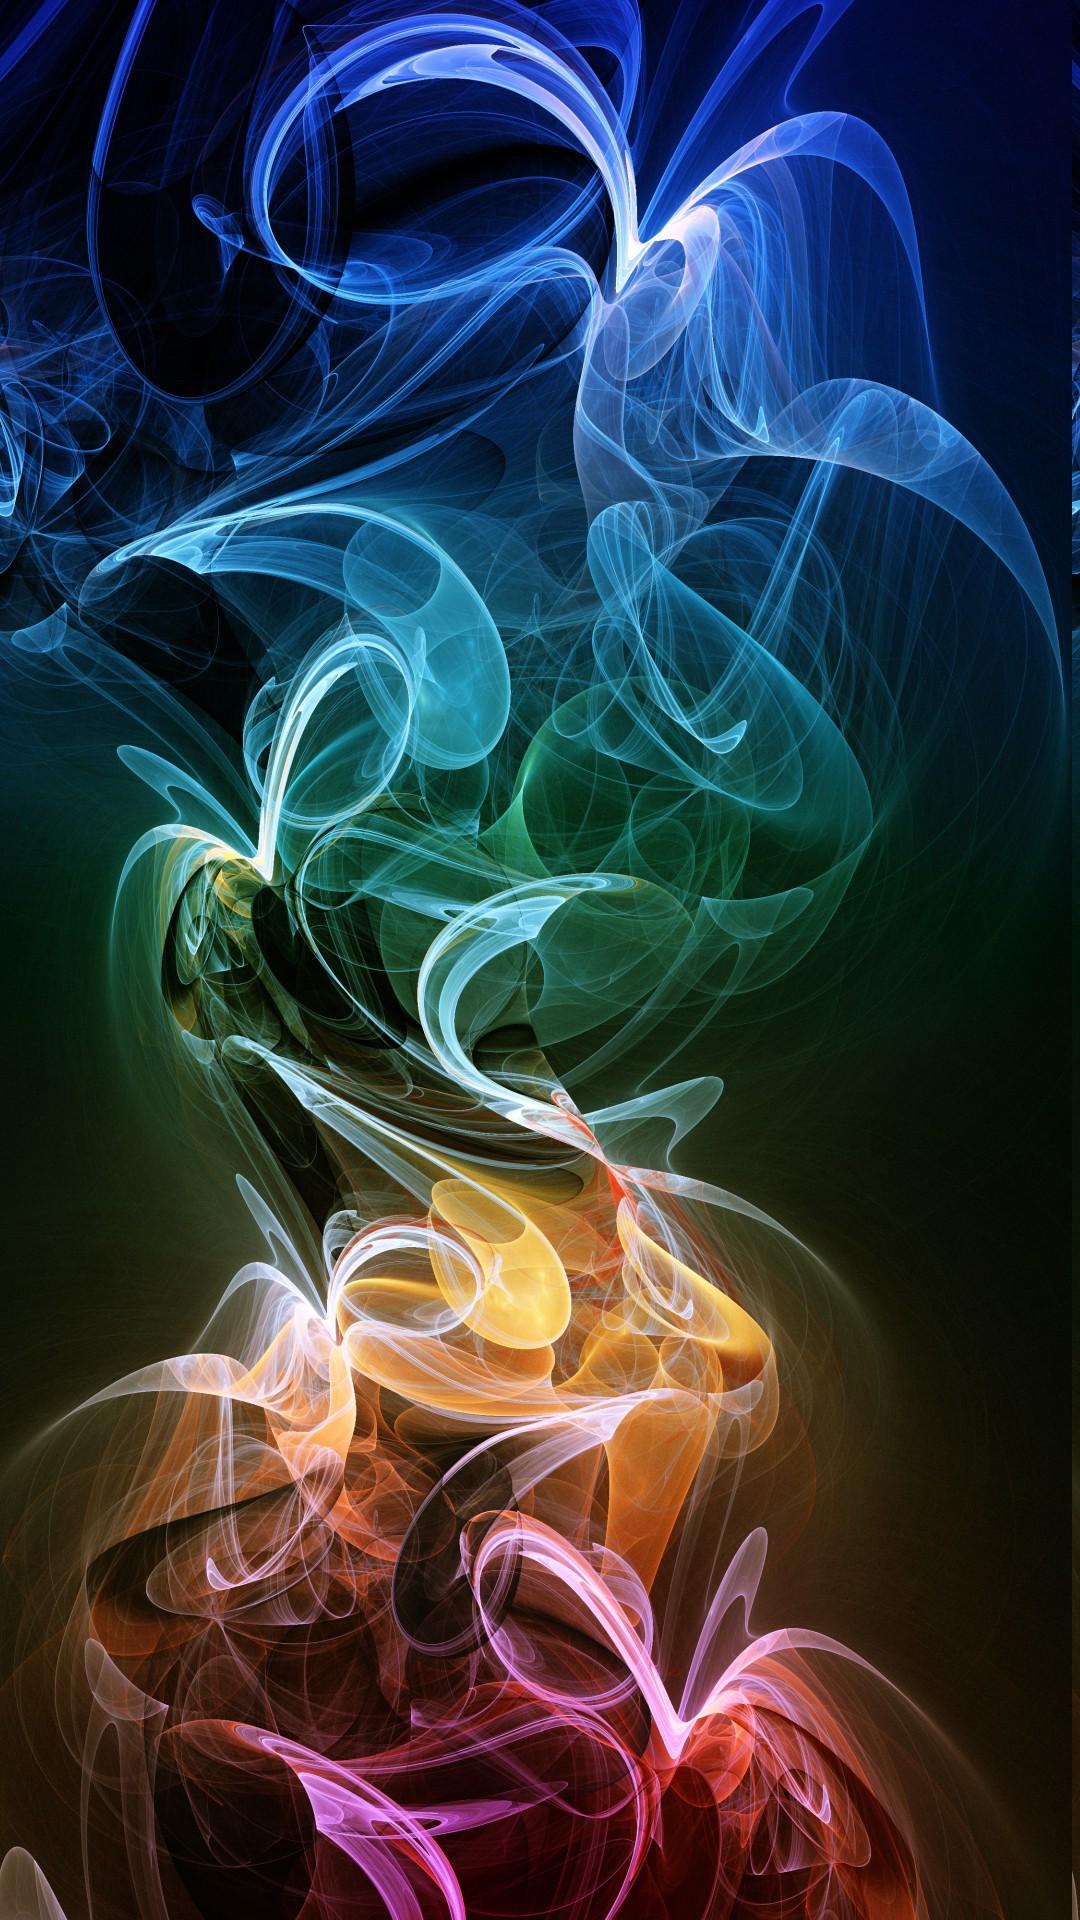 wallpaper illustration abstract smoke graphic design art